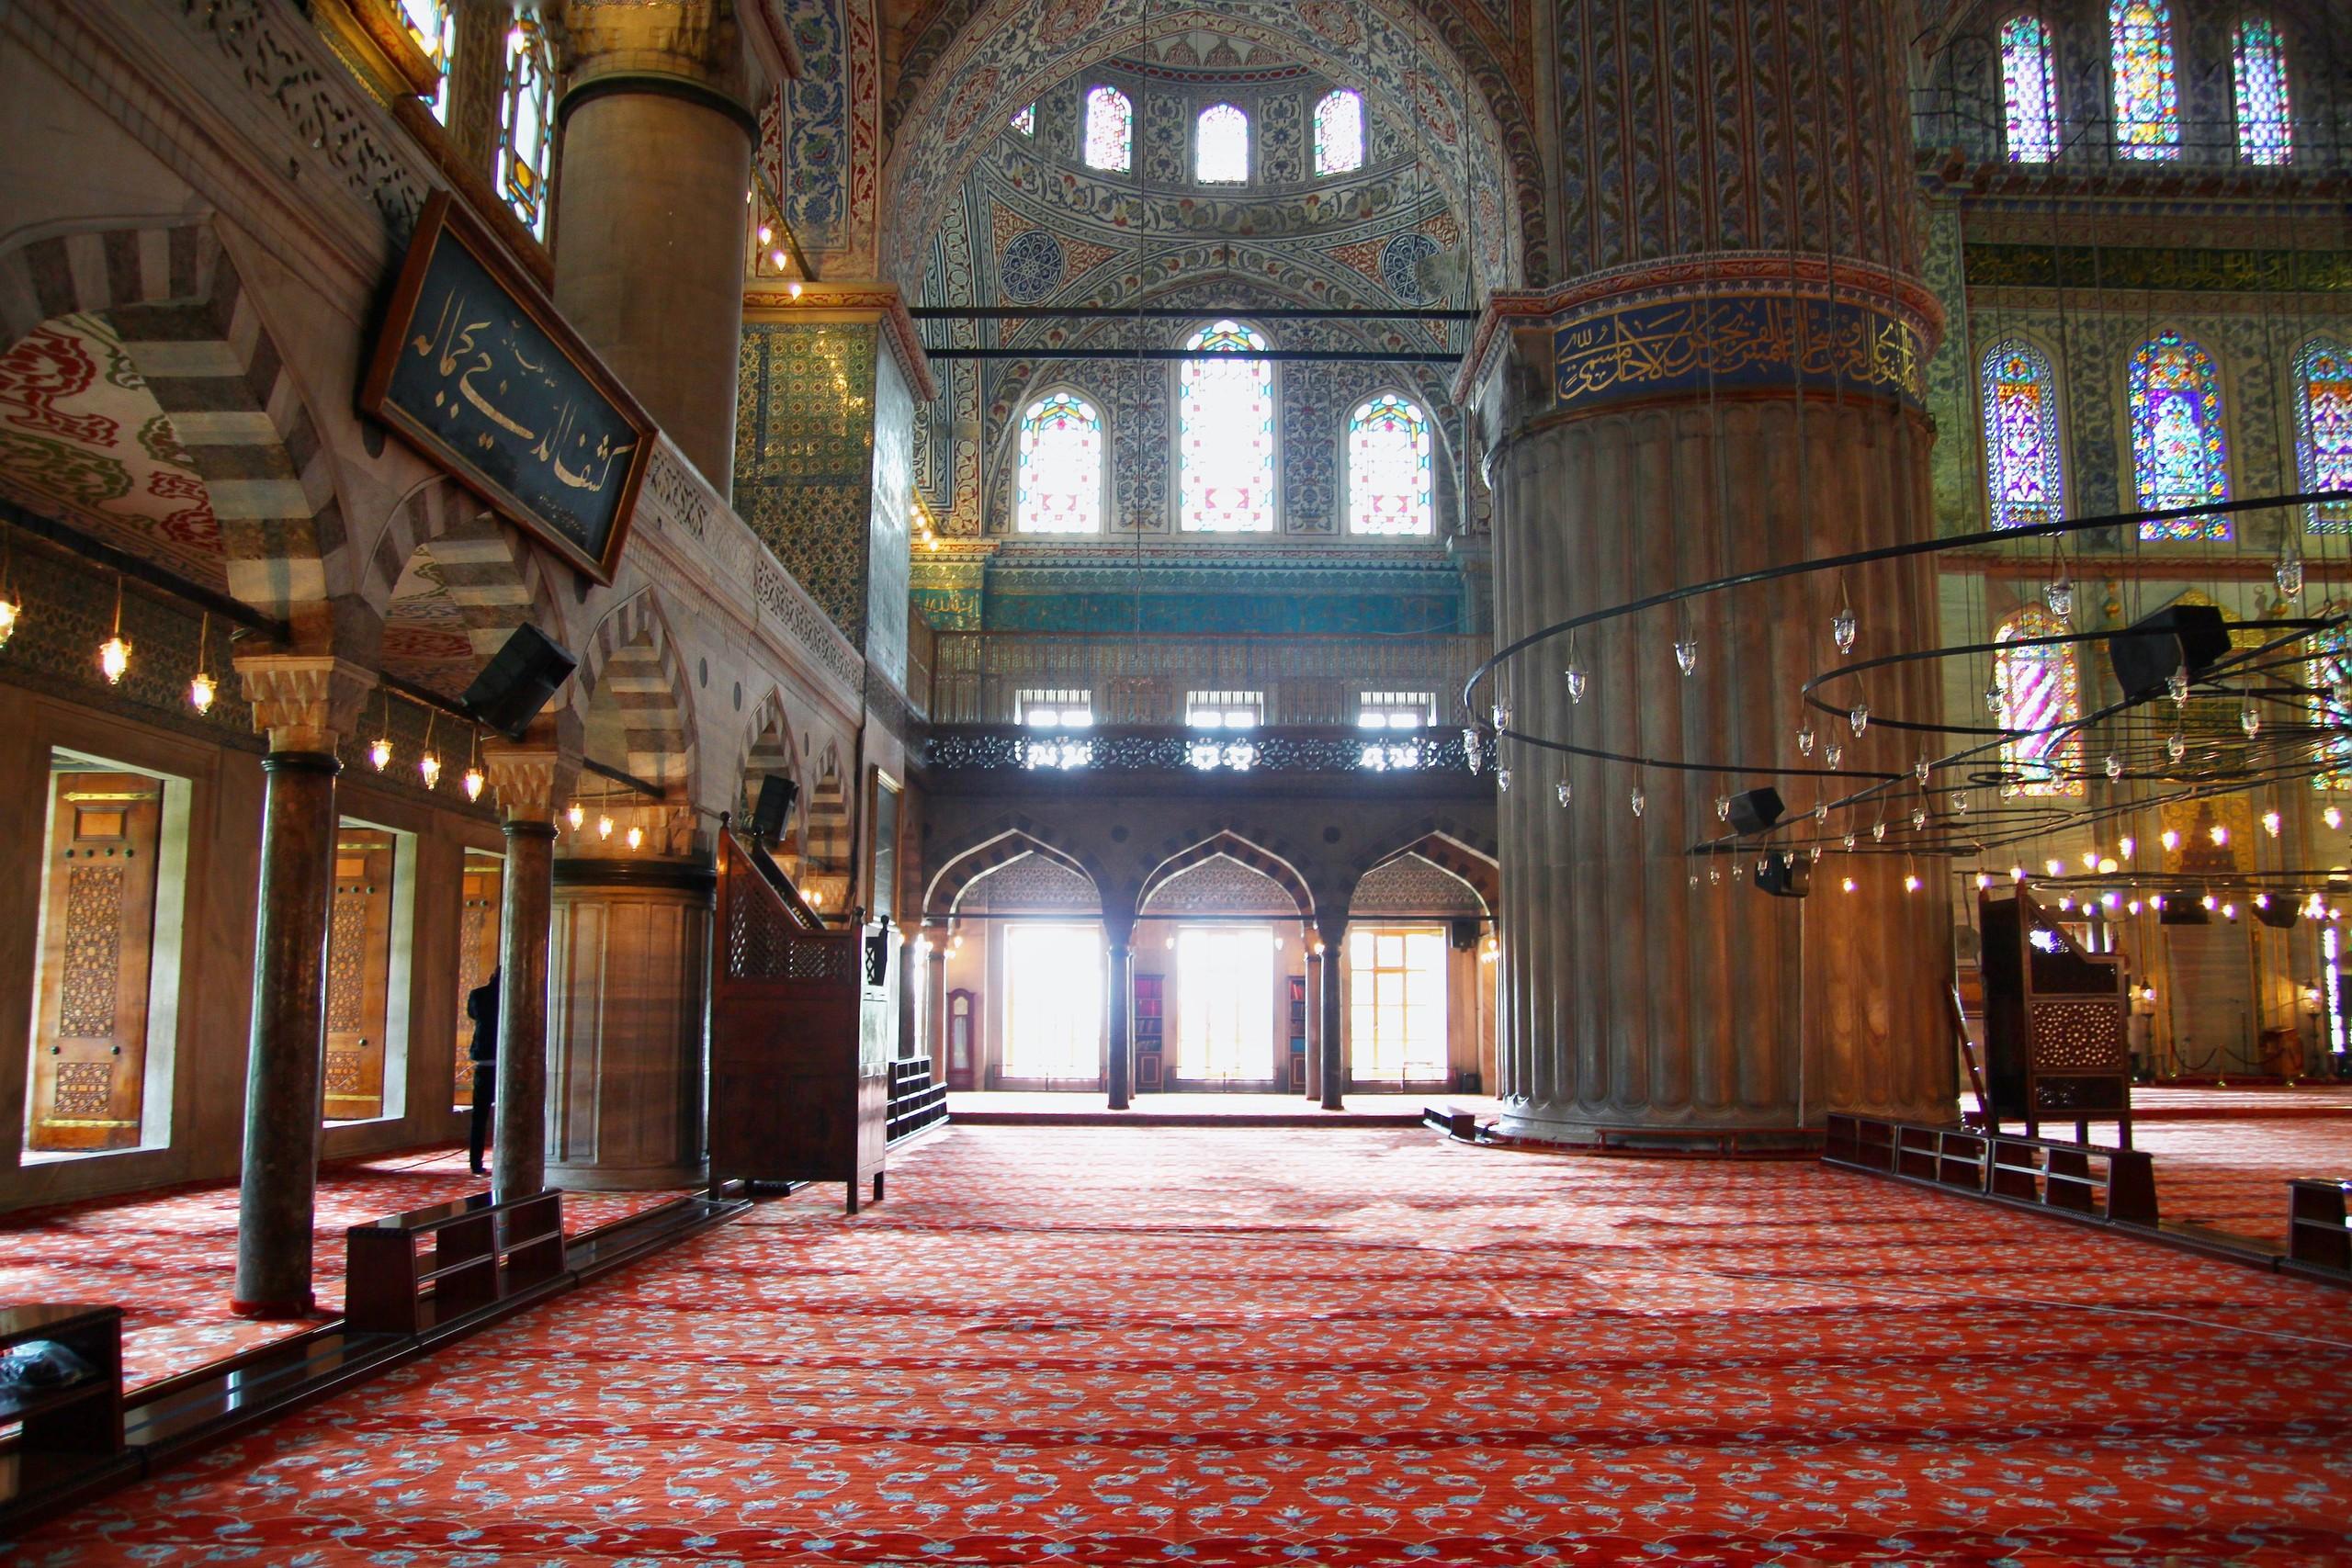 Pırlantadan Kubbeler #5: Sultanahmed - o7qW9b - Pırlantadan Kubbeler #5: Sultanahmed